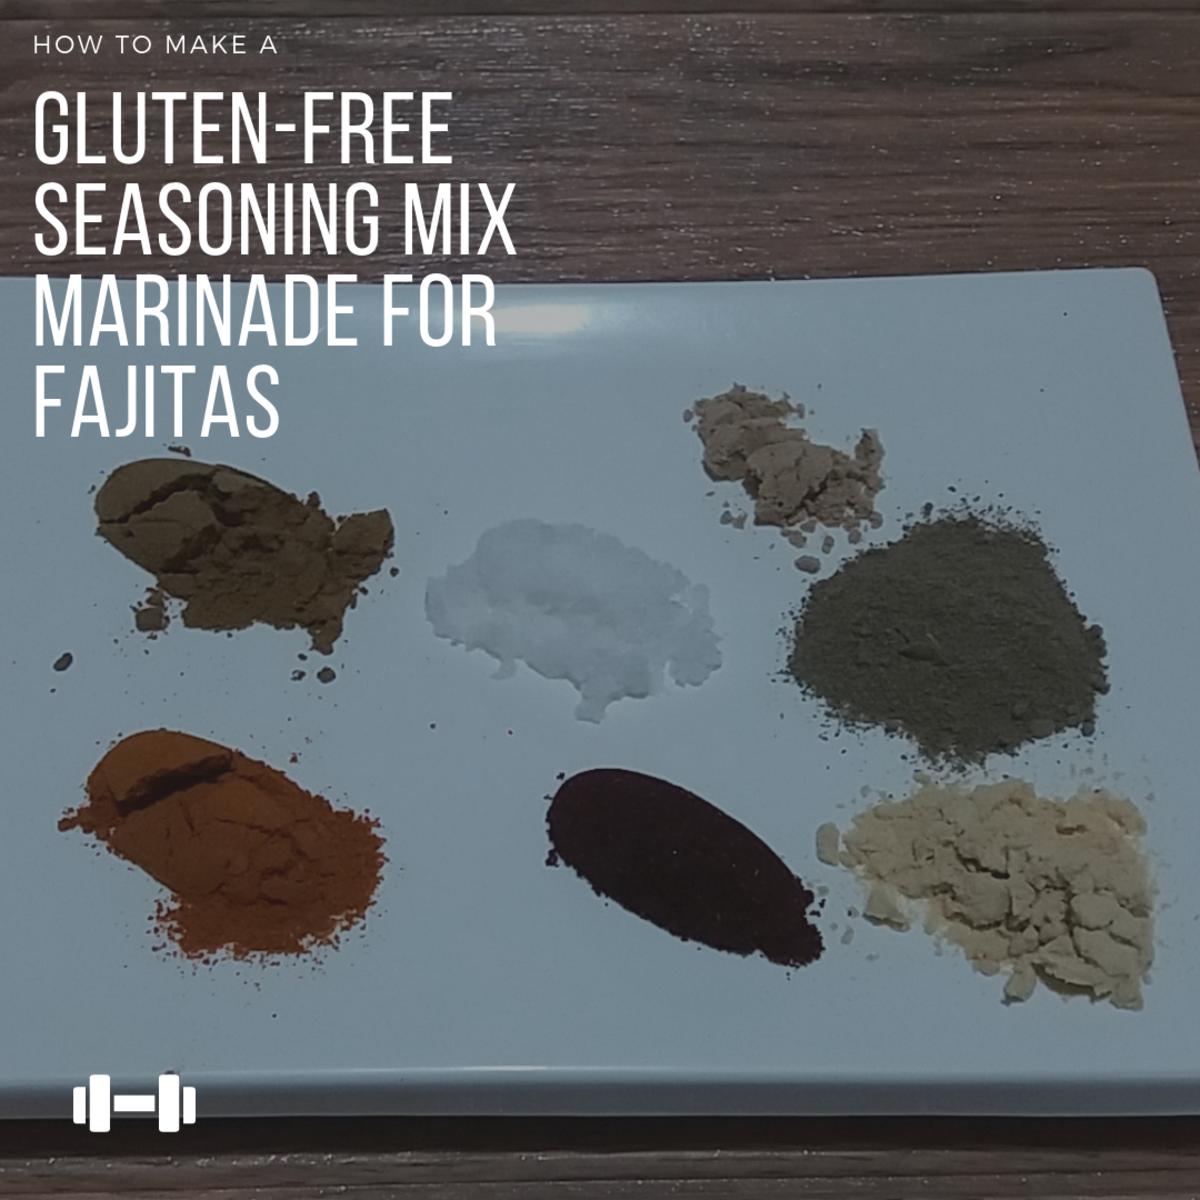 How to Make a Gluten-Free Seasoning Mix Marinade for Fajitas